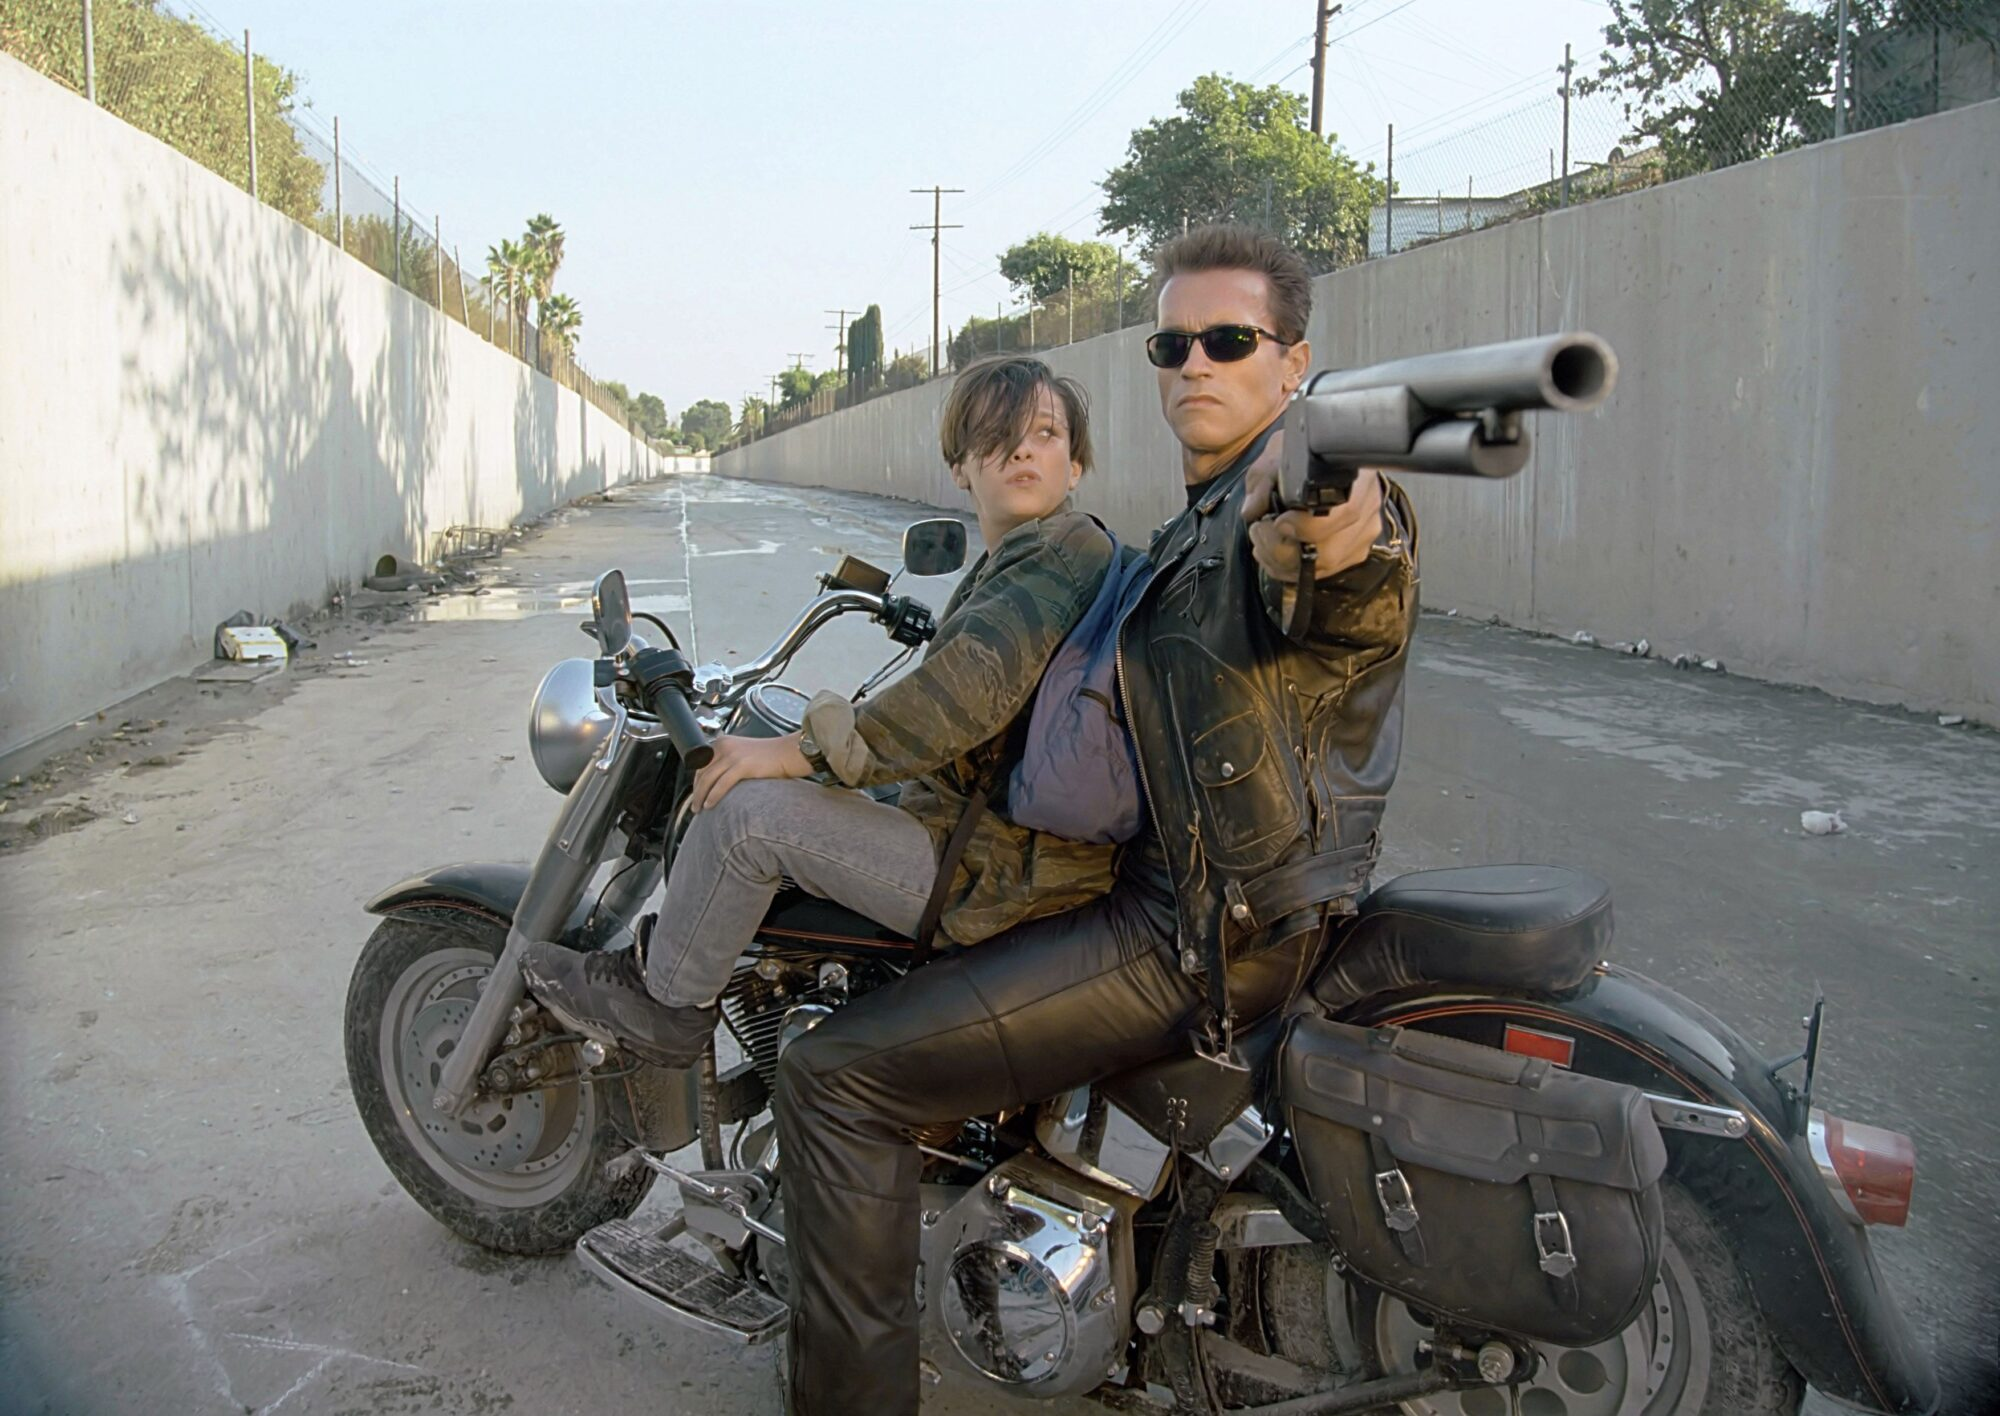 b2b675cb504 Review: Terminator 2: Judgment Day 3D - Slant Magazine